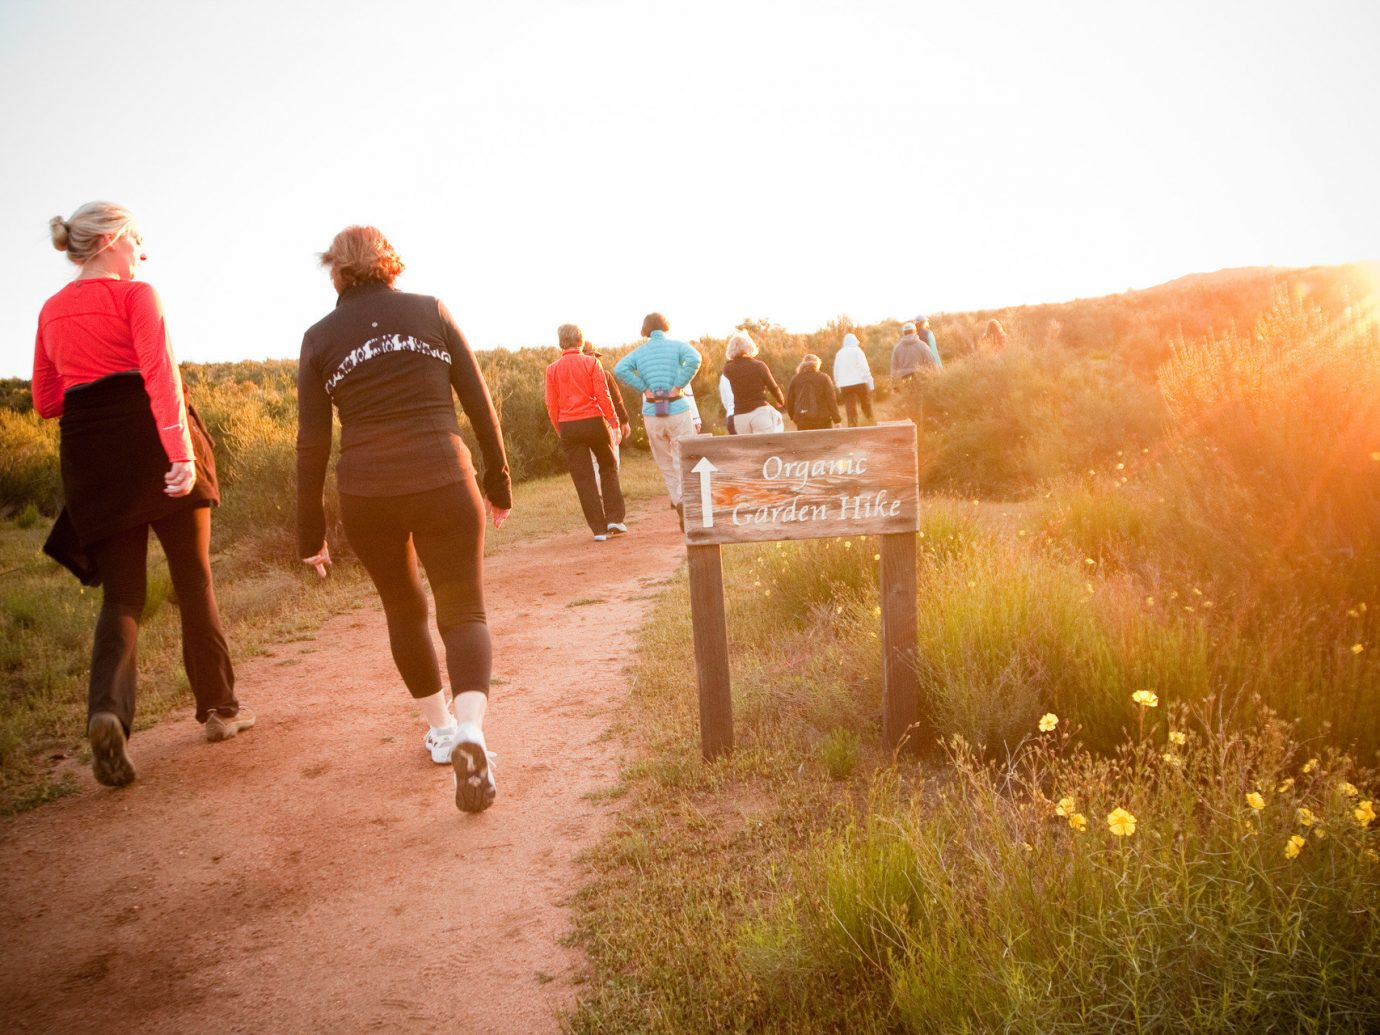 Health + Wellness Hotels Yoga Retreats sky outdoor color grass photograph image people morning season sunlight running sports walking